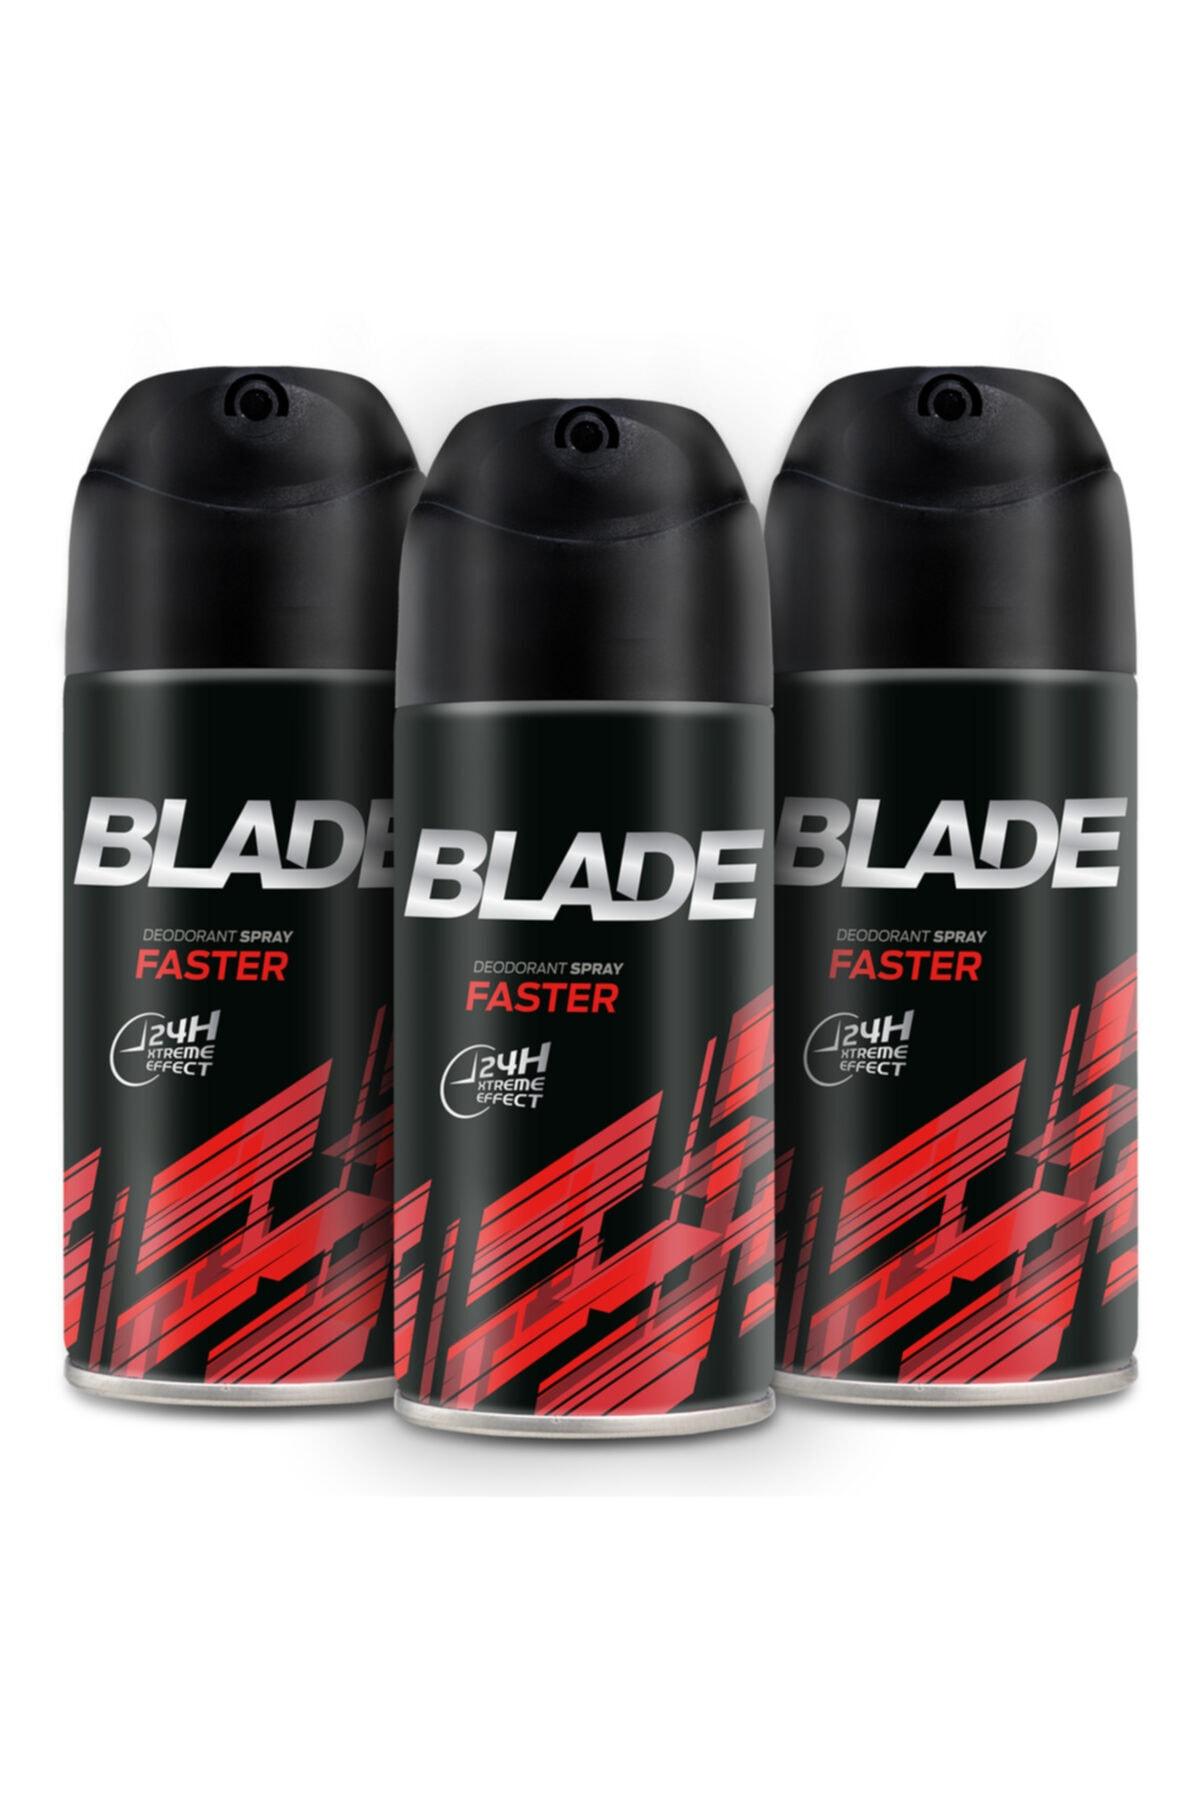 Blade Faster Erkek Deodorant 3x150ml 1